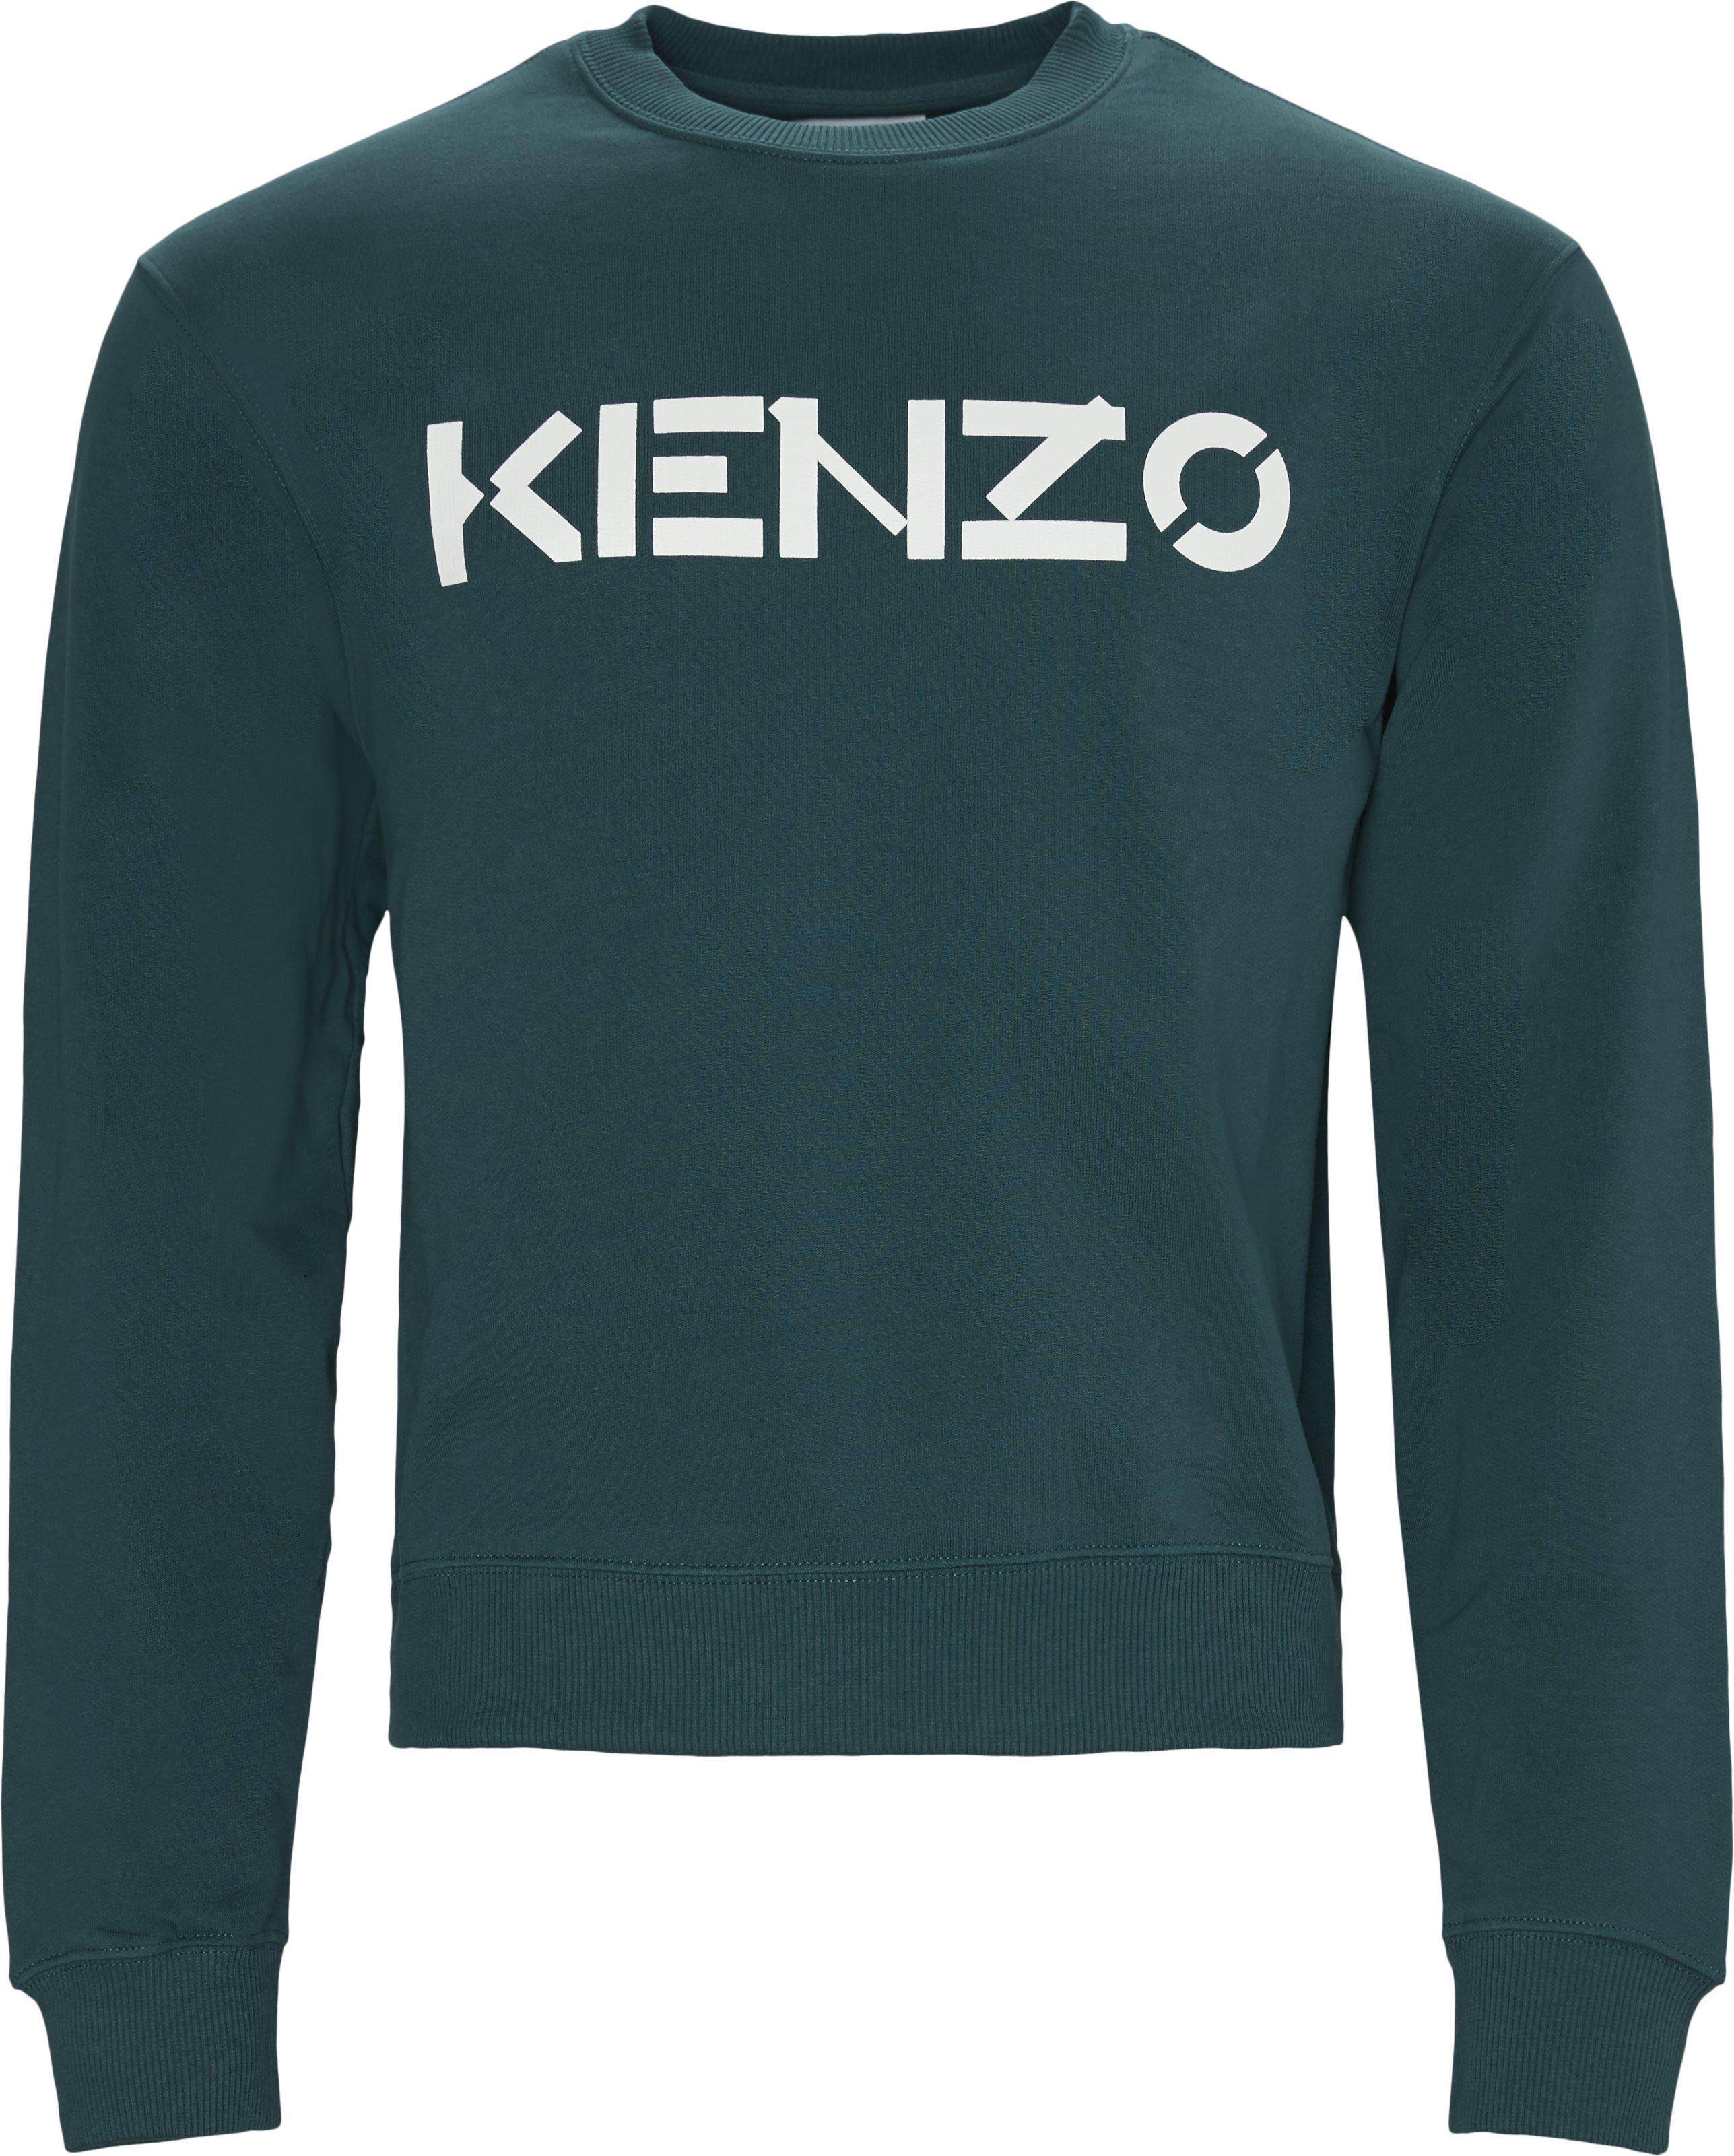 Sweatshirts - Oversize fit - Blue